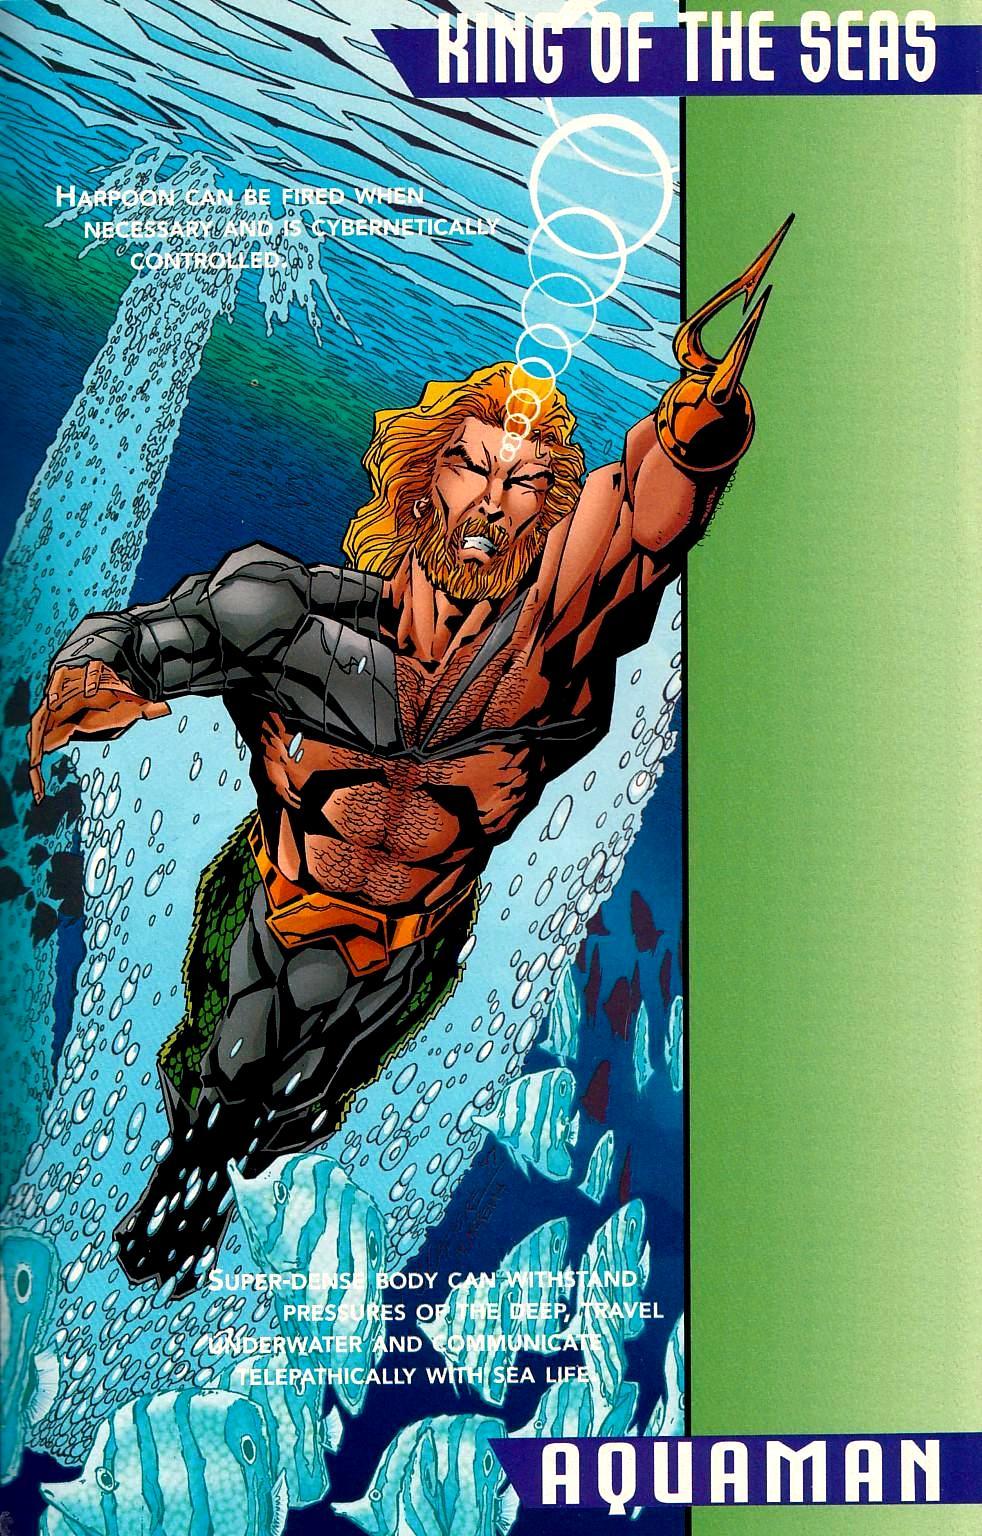 http://vignette3.wikia.nocookie.net/marvel_dc/images/0/0a/Aquaman_0081.jpg/revision/latest?cb=20110606002549